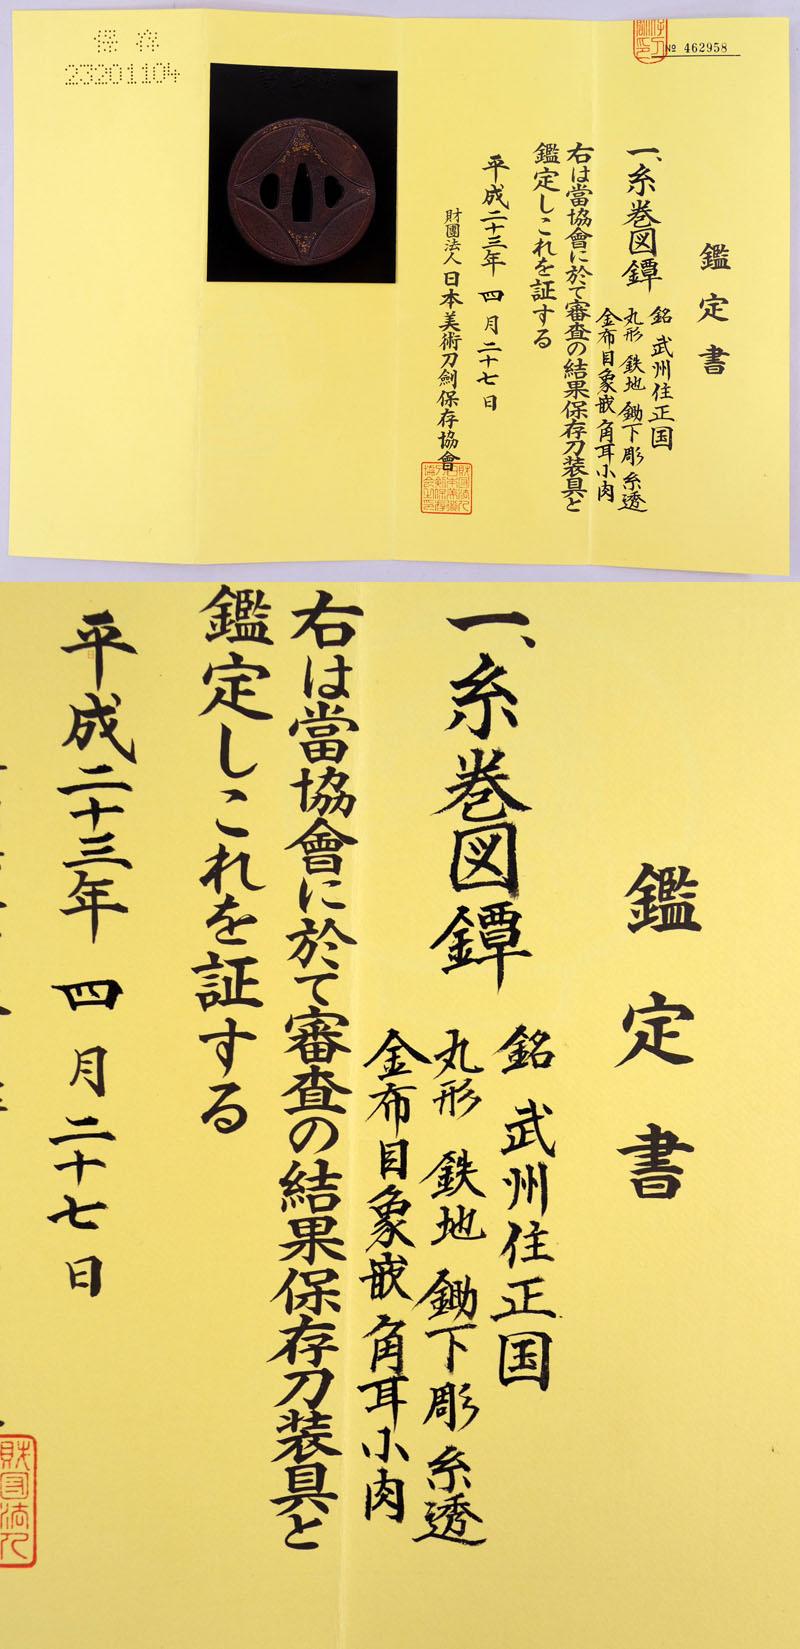 糸巻図鍔 武州住正国 Picture of Certificate